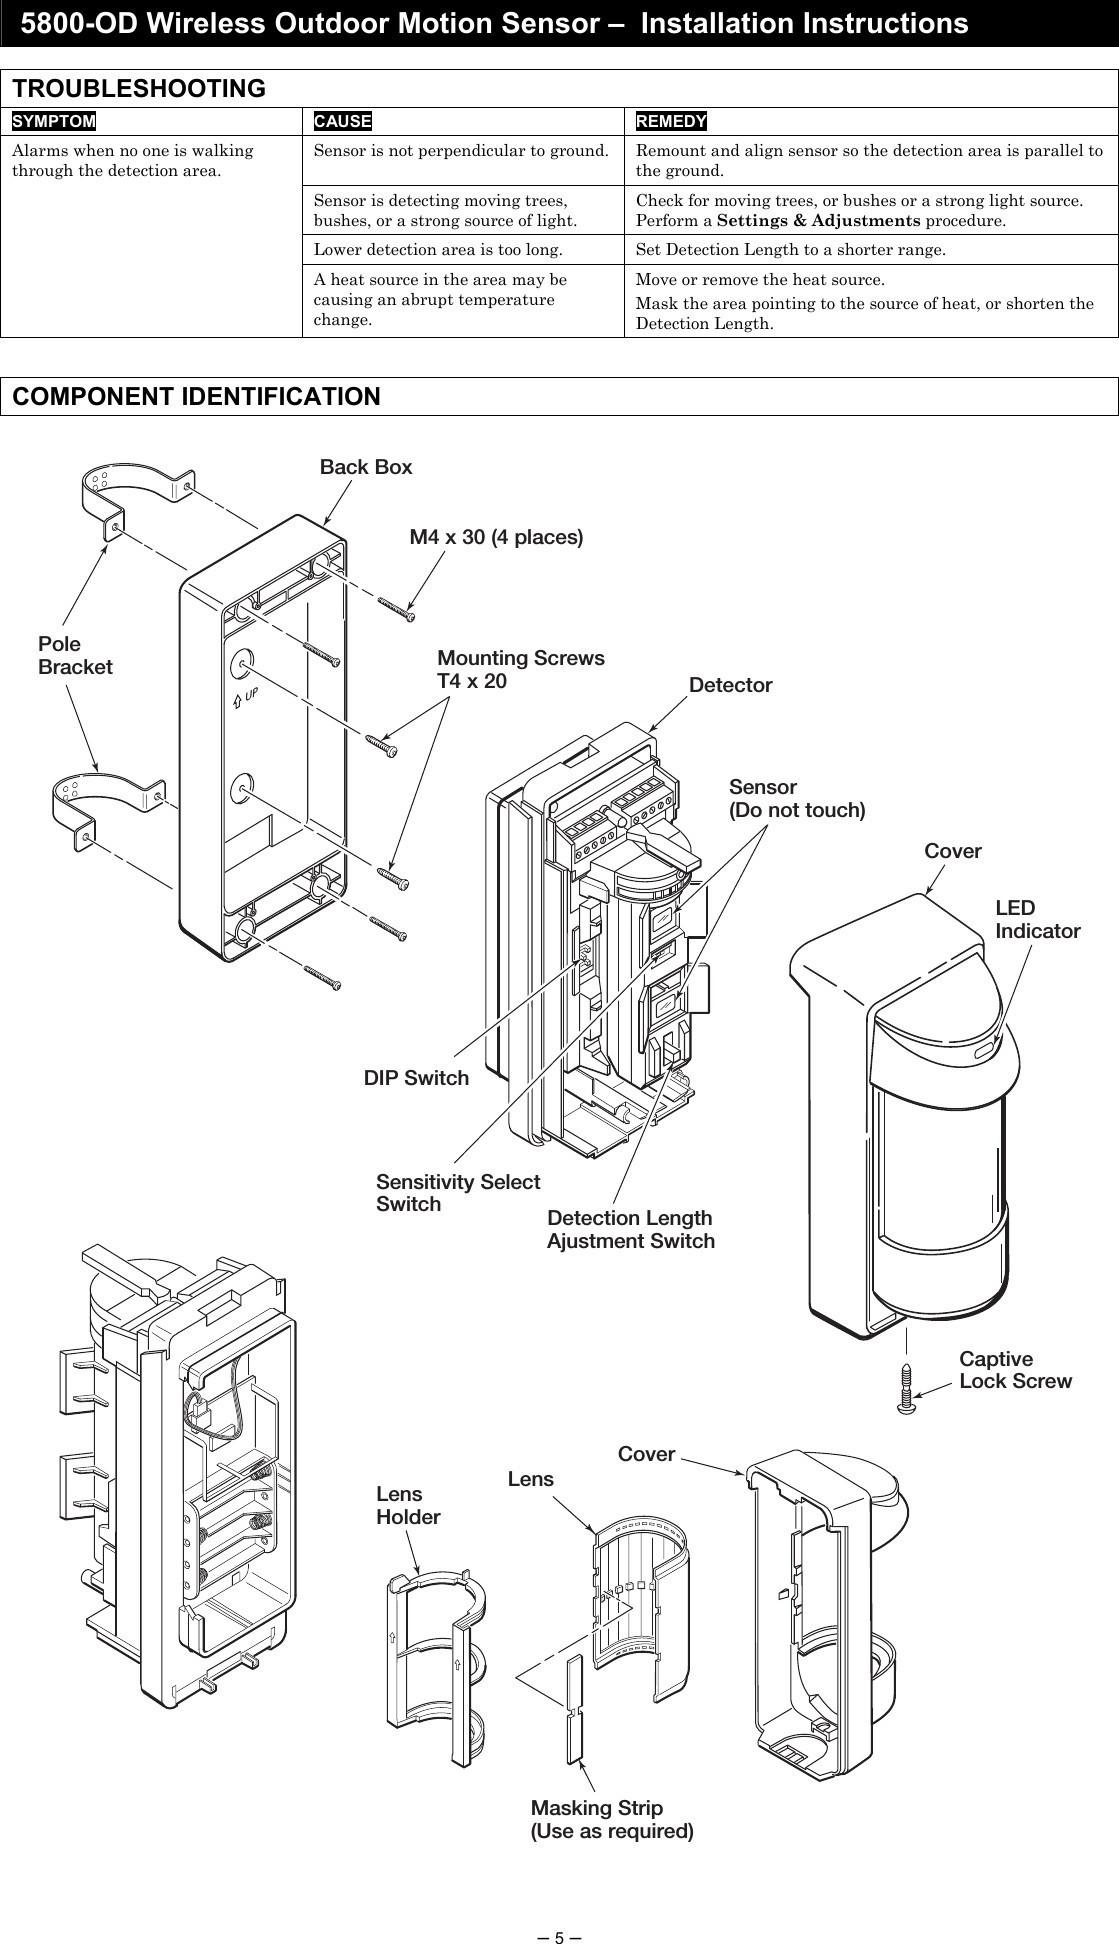 automotive wiring diagram drawing software best valid wiring diagram rh ipphil Honeywell Thermostat Troubleshooting Honeywell Thermostat Wire Colors